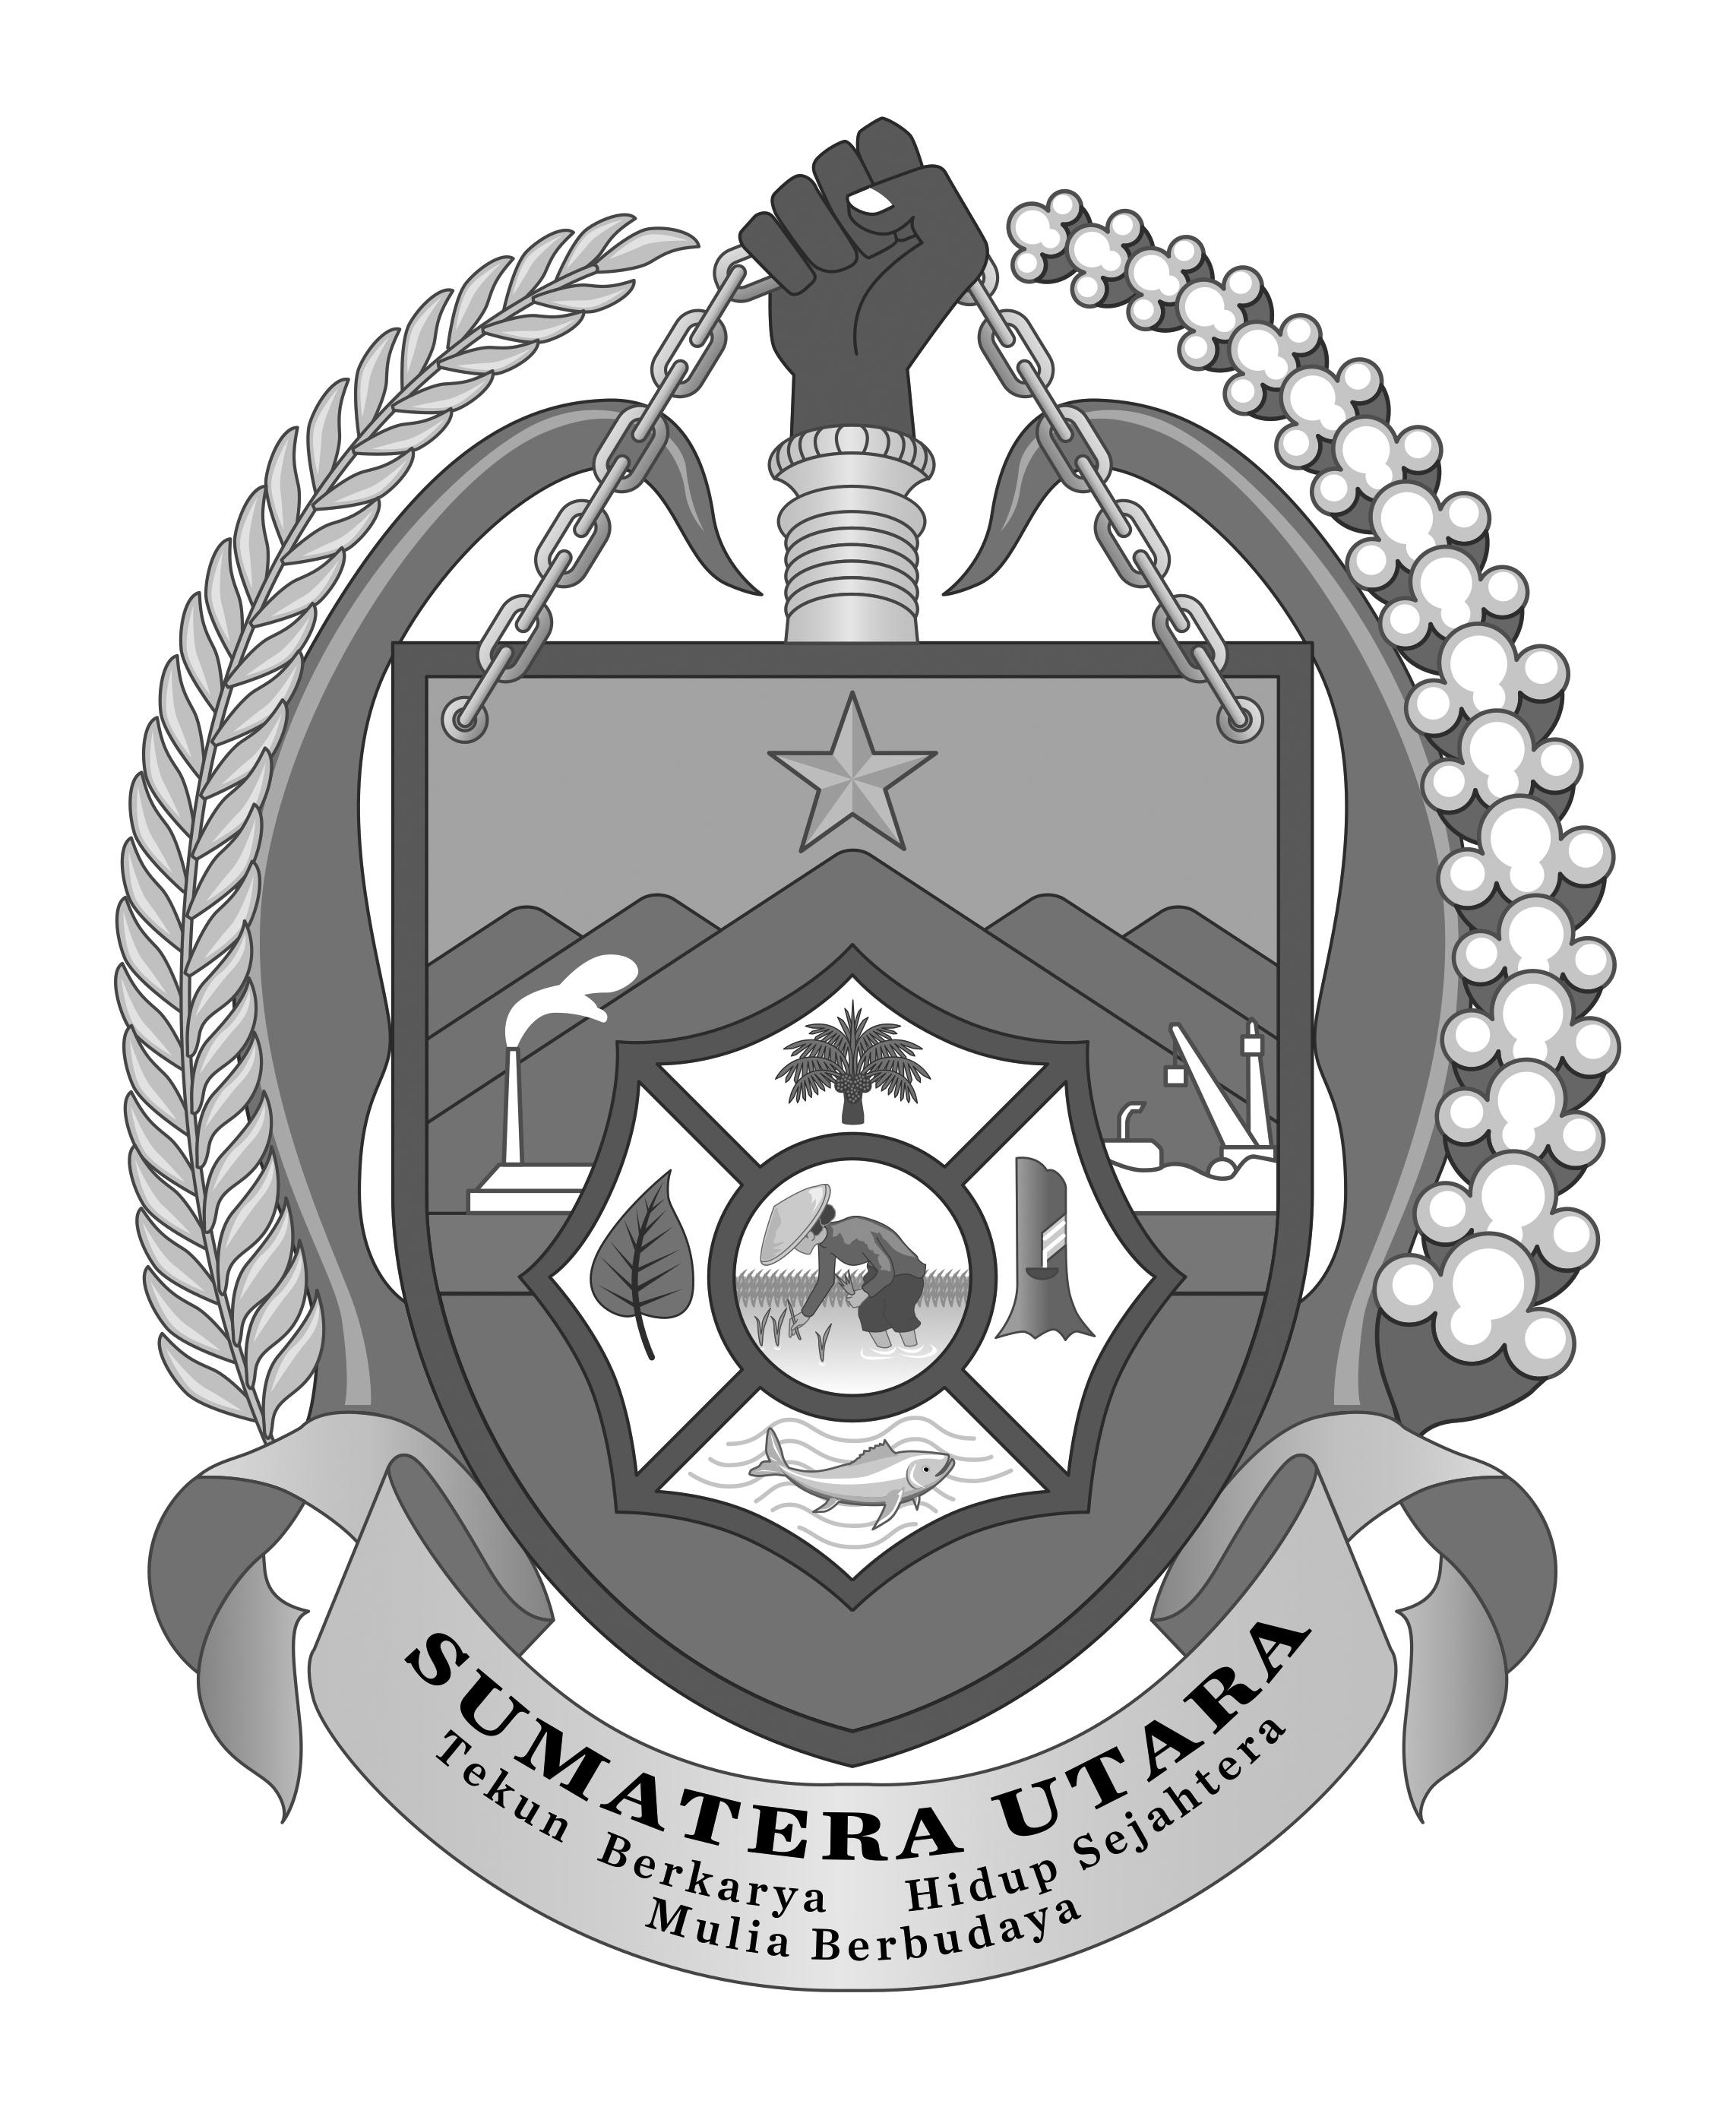 Logo Sumatera Utara (Provinsi Sumatera Utara) Grayscale